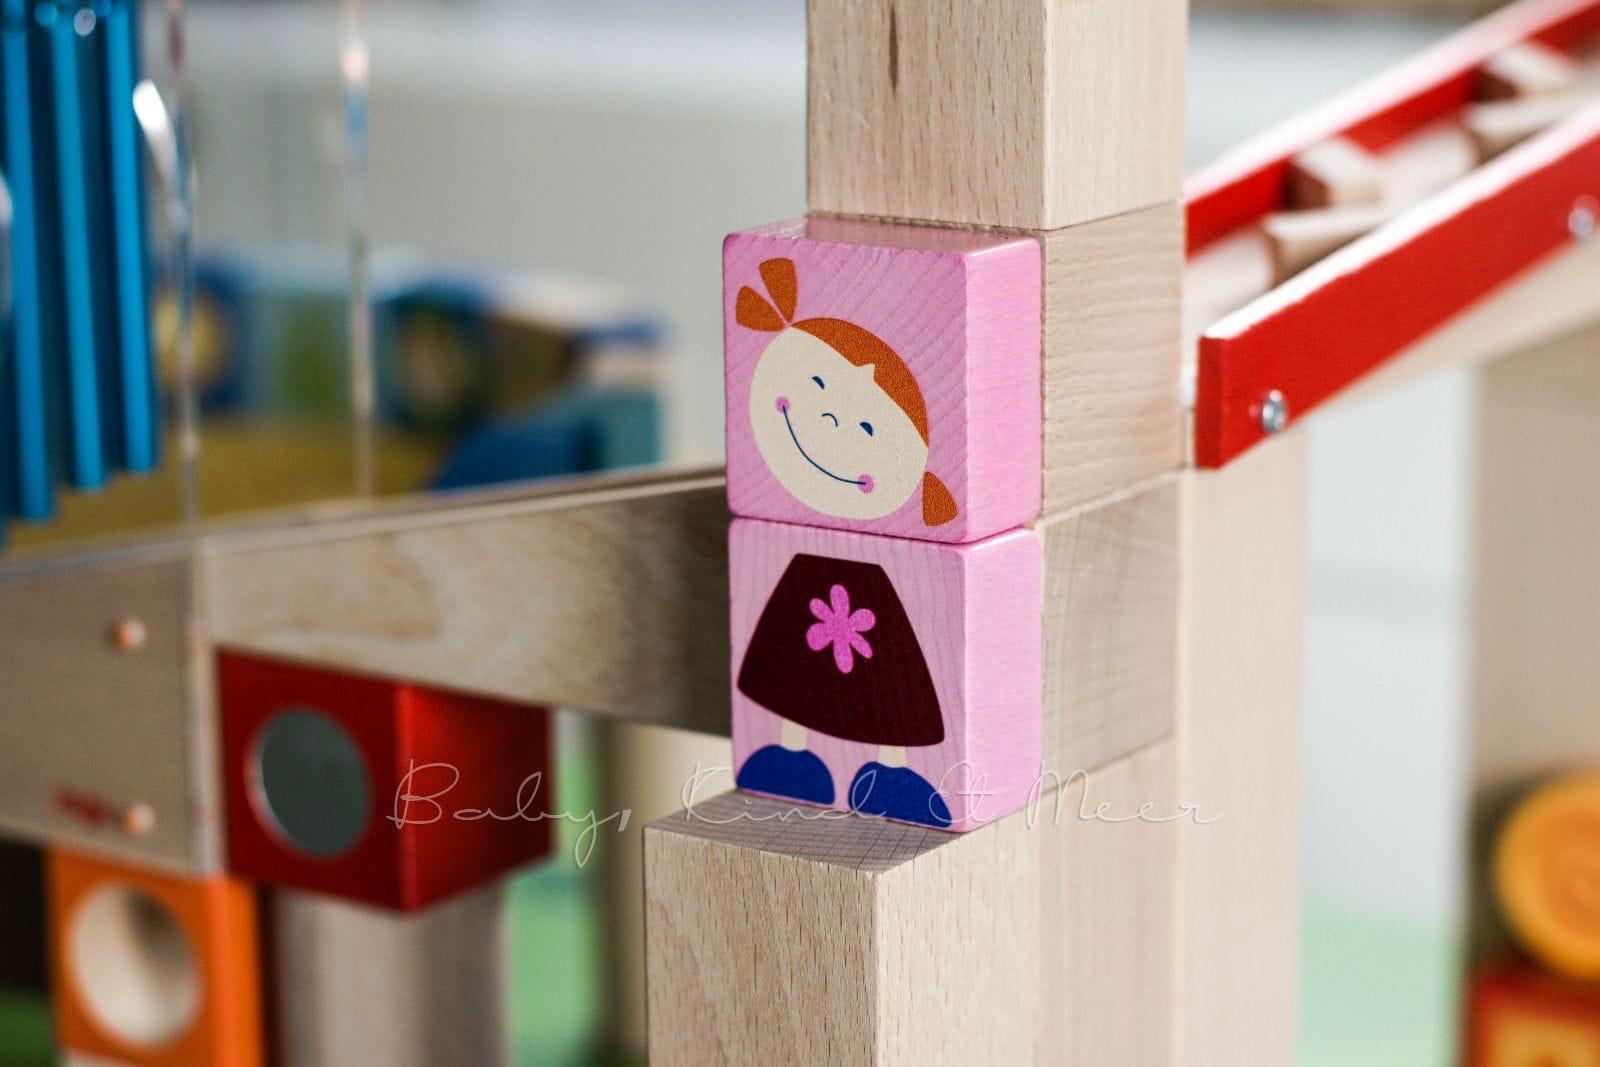 Motorik FleißIg Kugelbahn Holz Ikea Spielzeug Baby Kleinkind Spielzeug